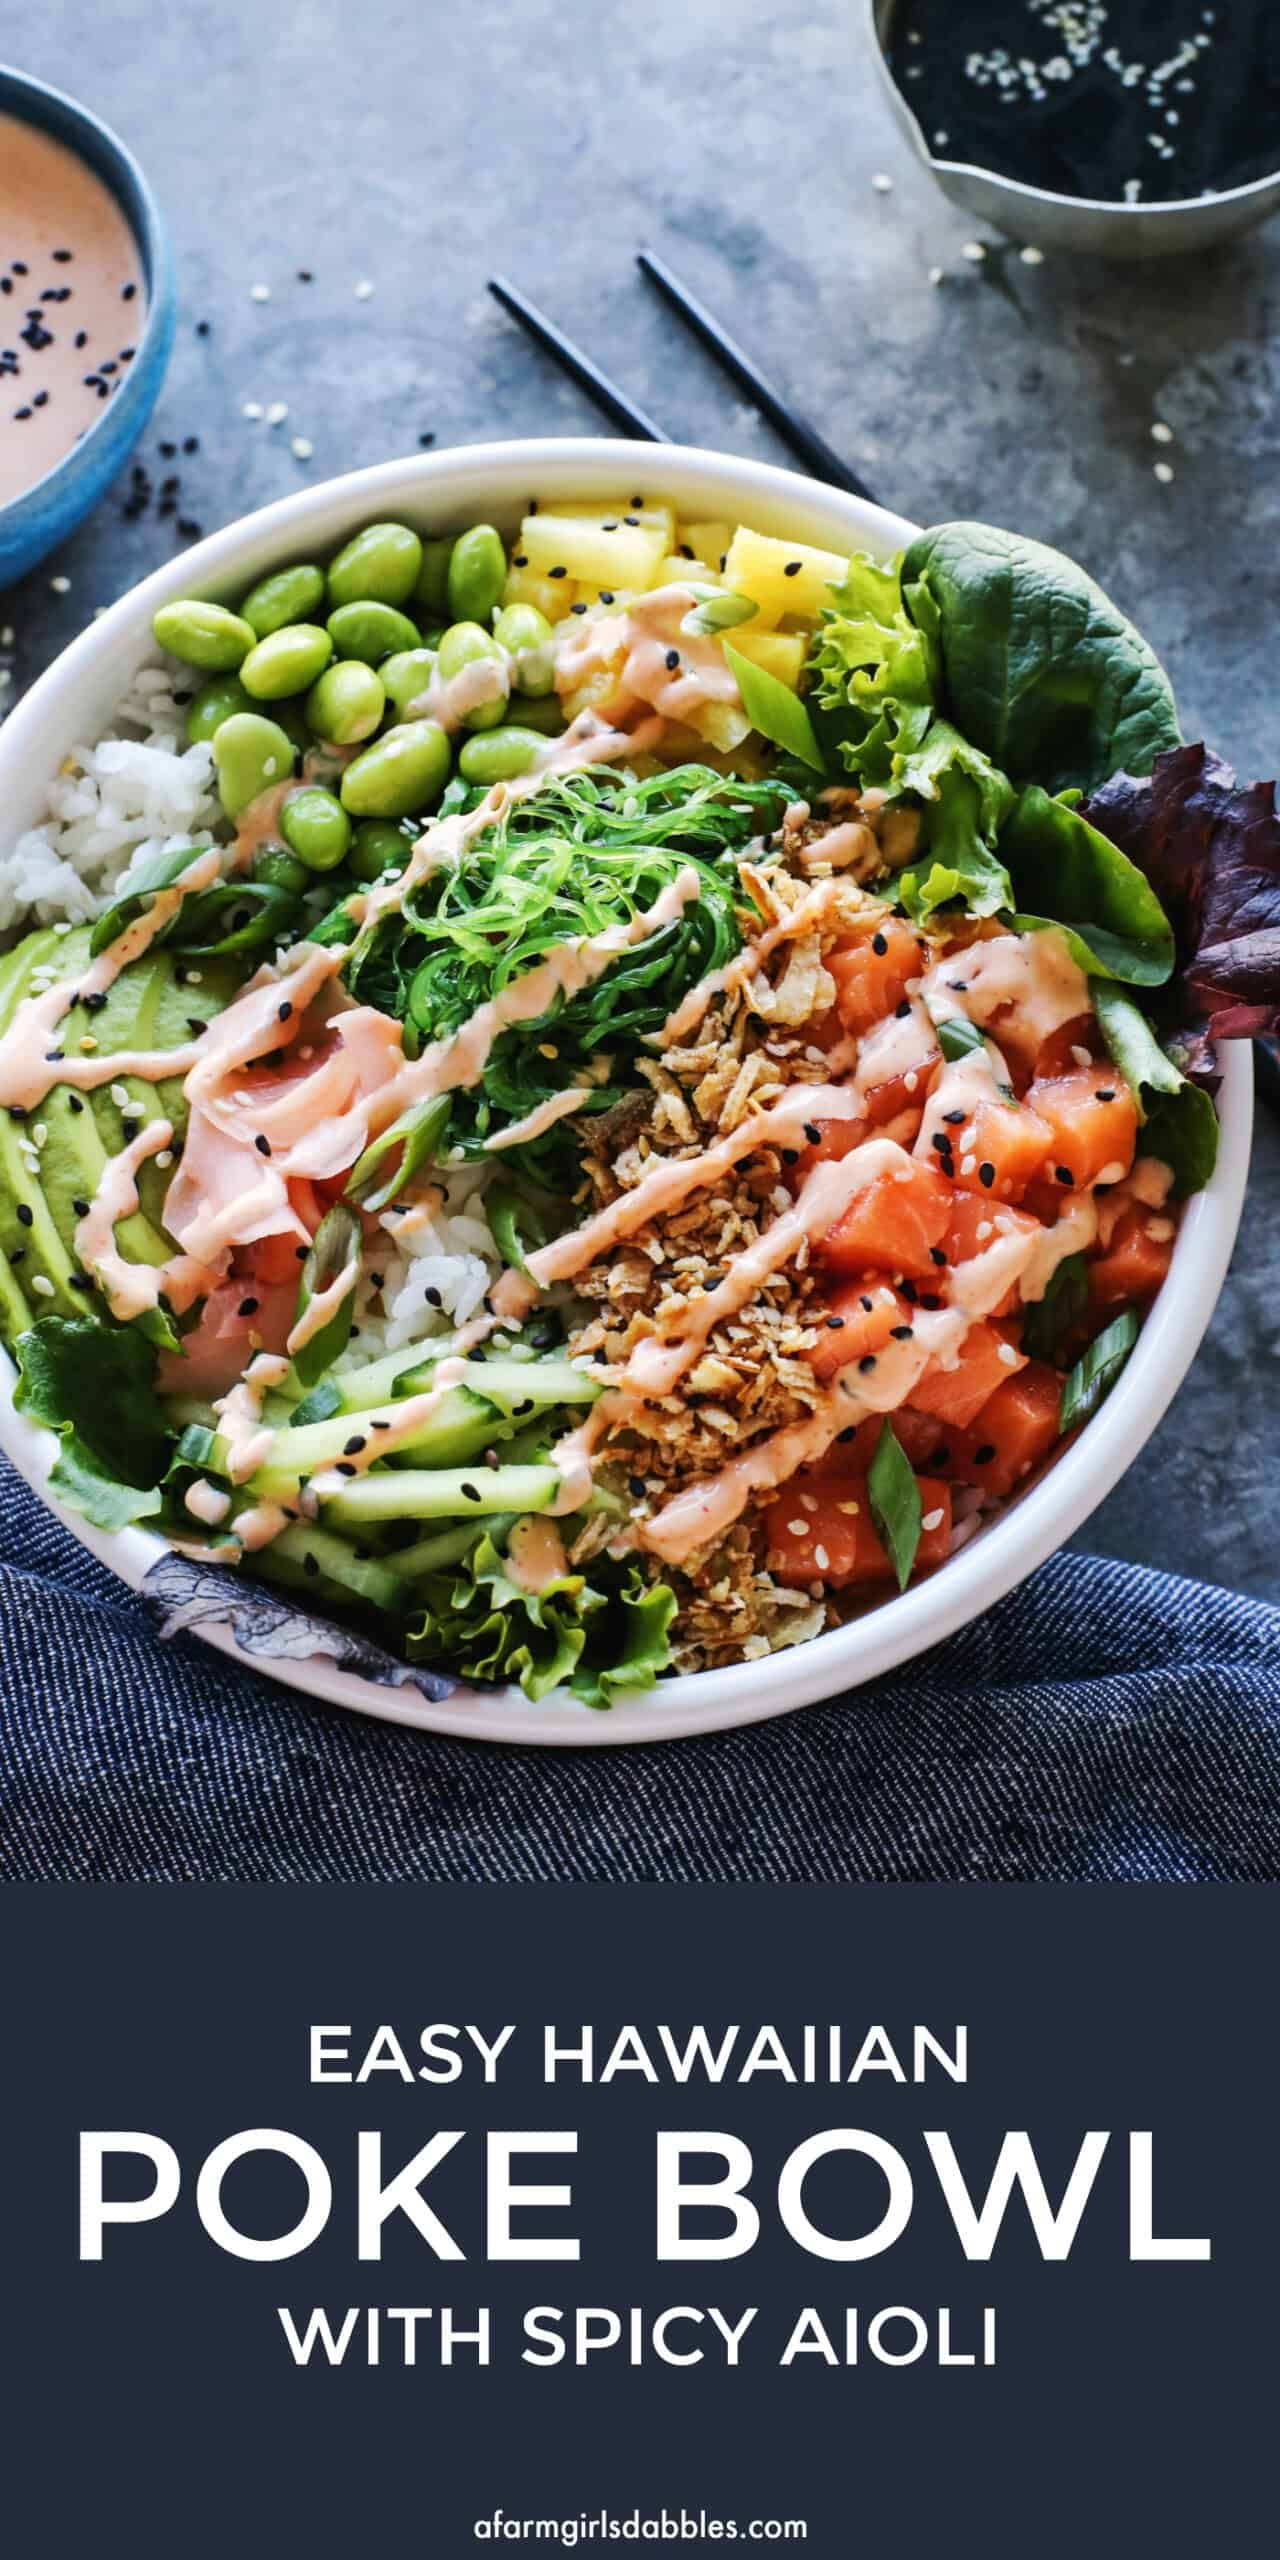 Easy hawaiian poke bowl with spicy aioli recipe in 2020